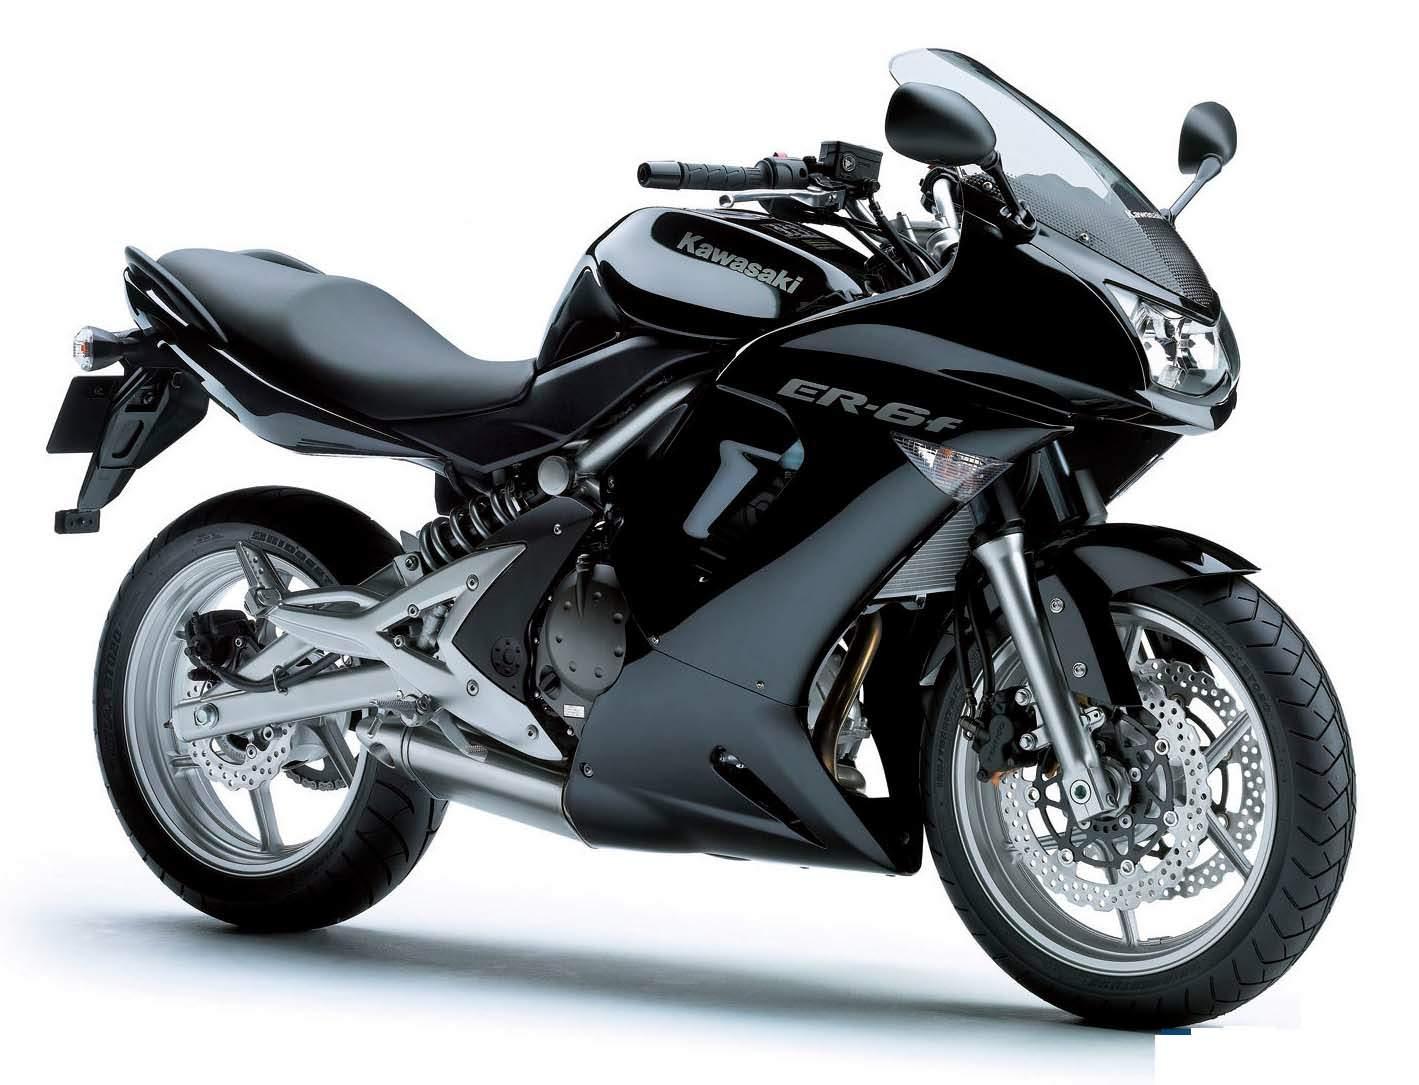 er-6f 2006 – bikesrepublic